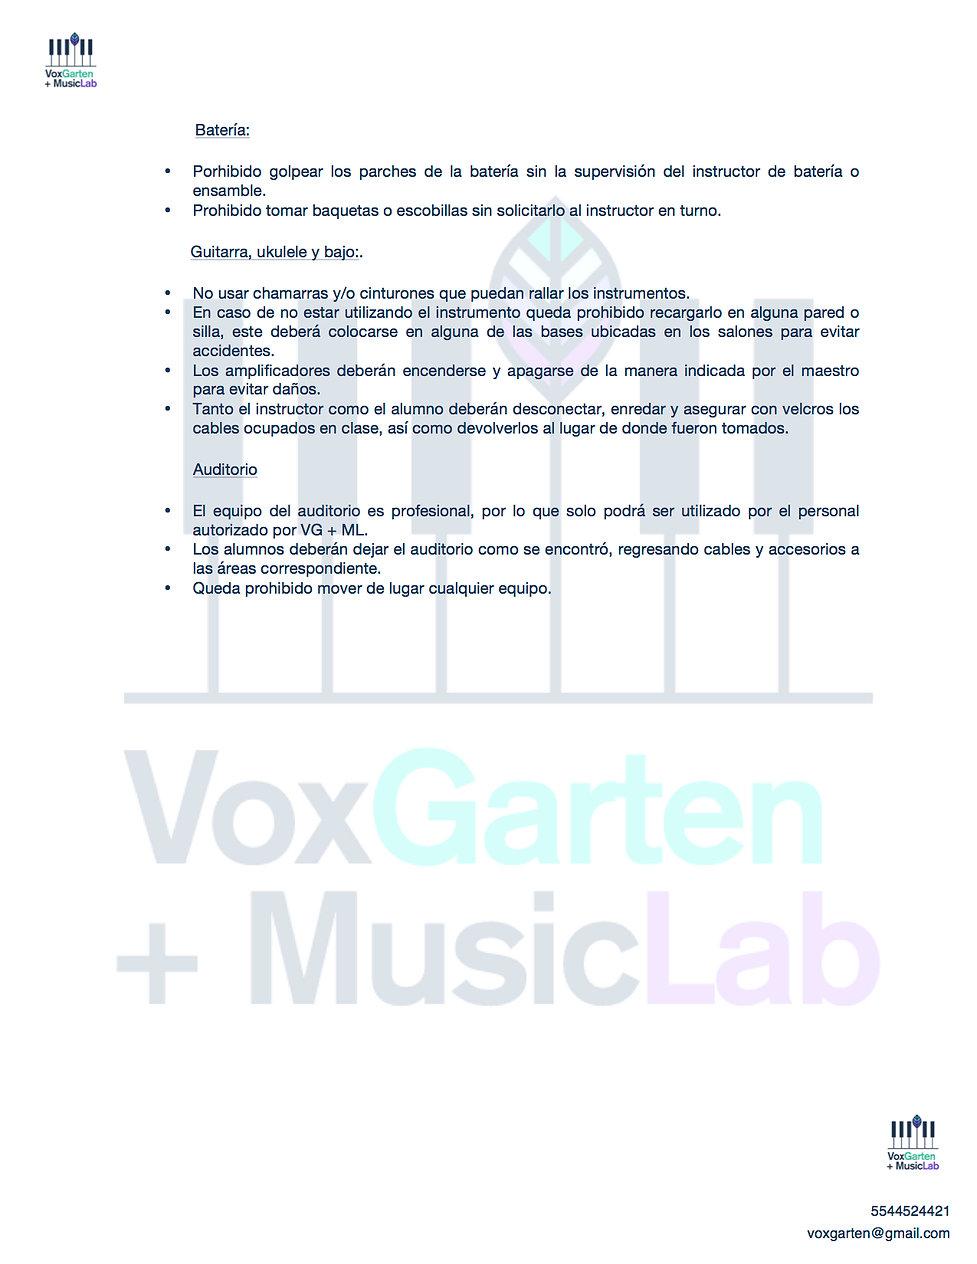 REGLAMENTO VG+ML7.jpg